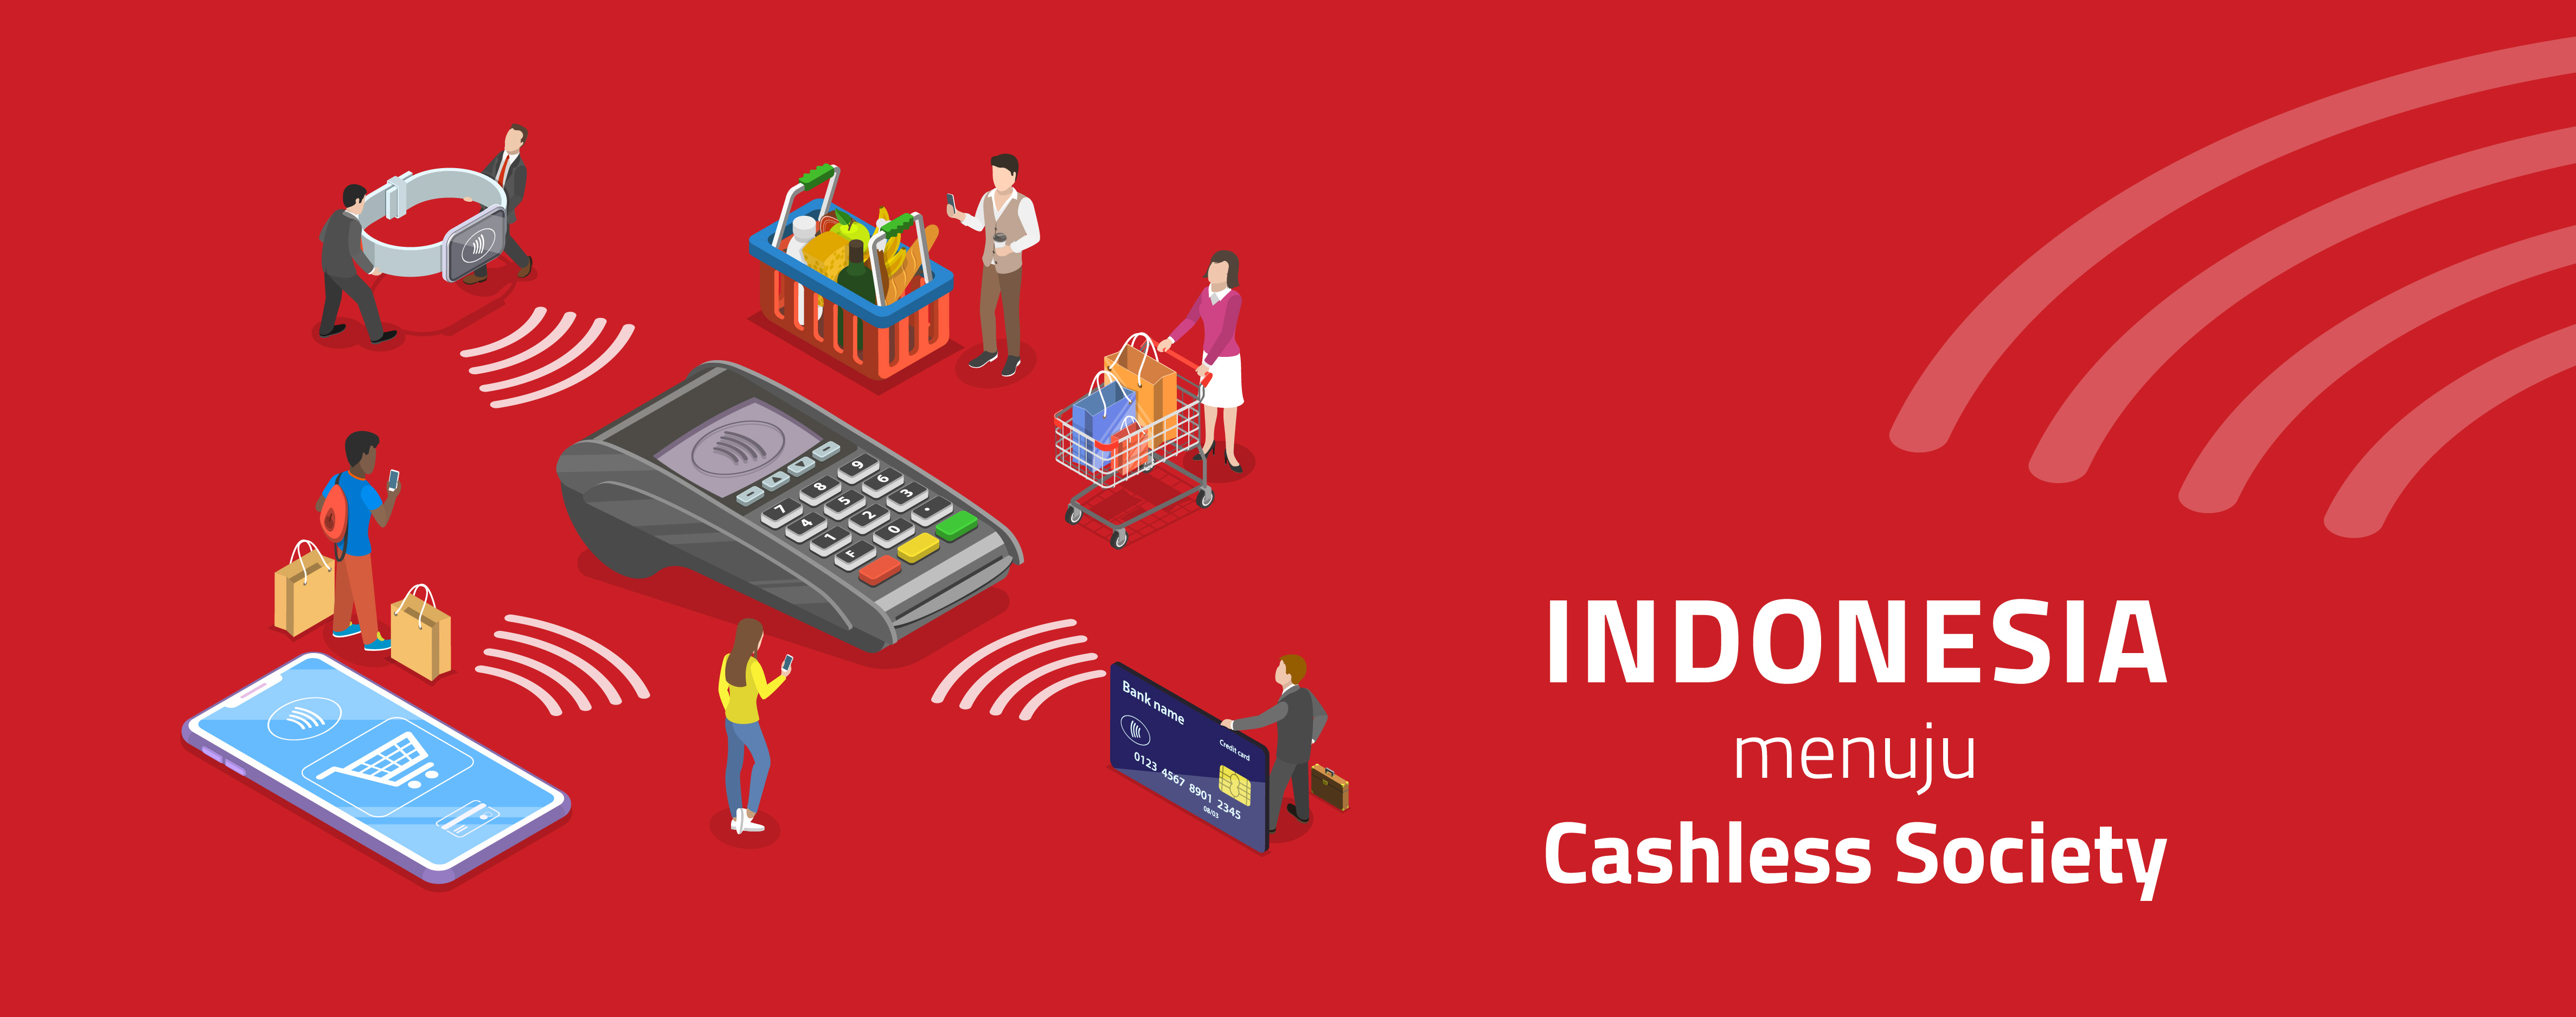 Indonesia menuju cashless society